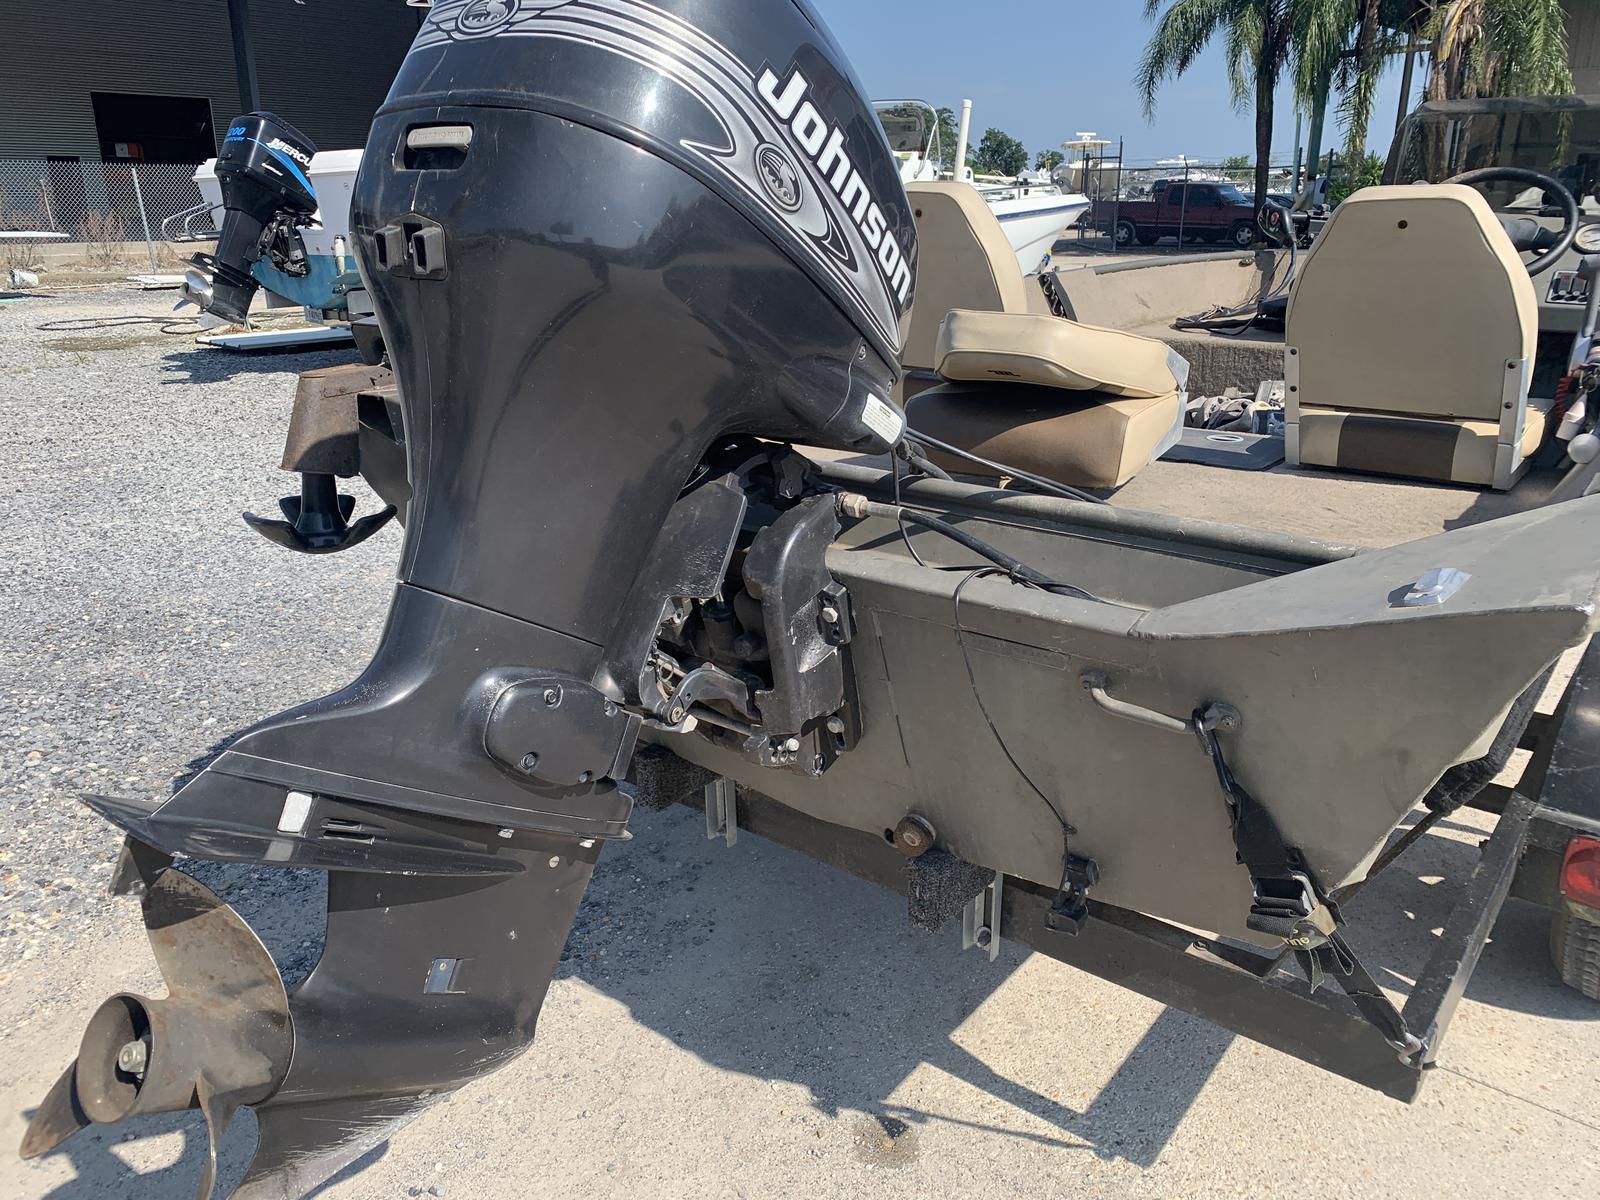 2007 WeldBilt 16 boat for sale, model of the boat is 16 & Image # 4 of 7